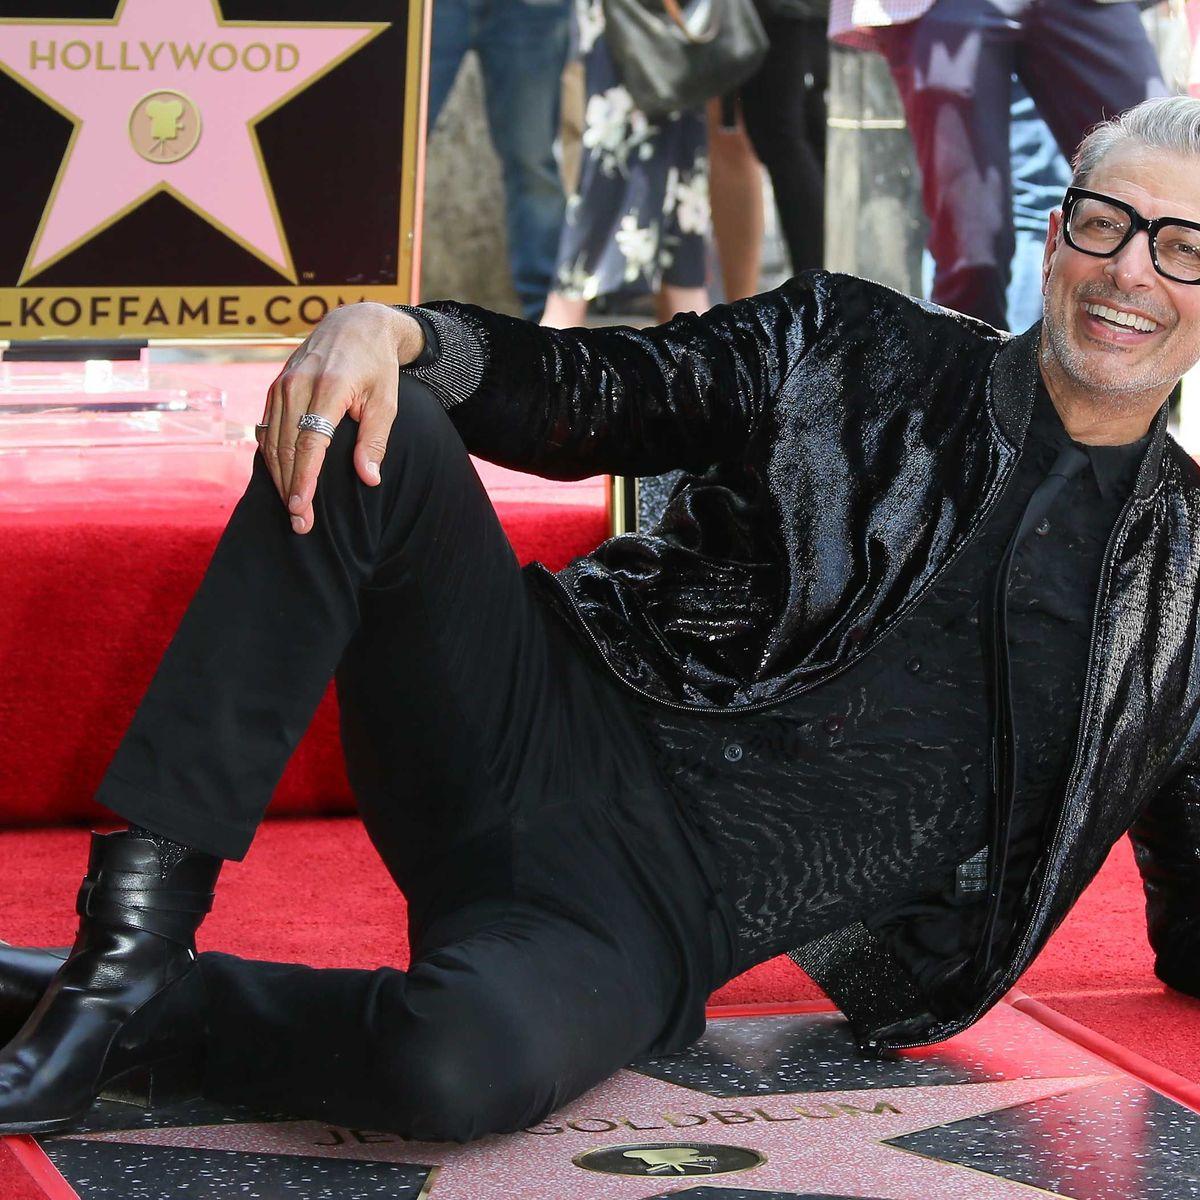 Jeff-Goldblum-Walk-of-Fame